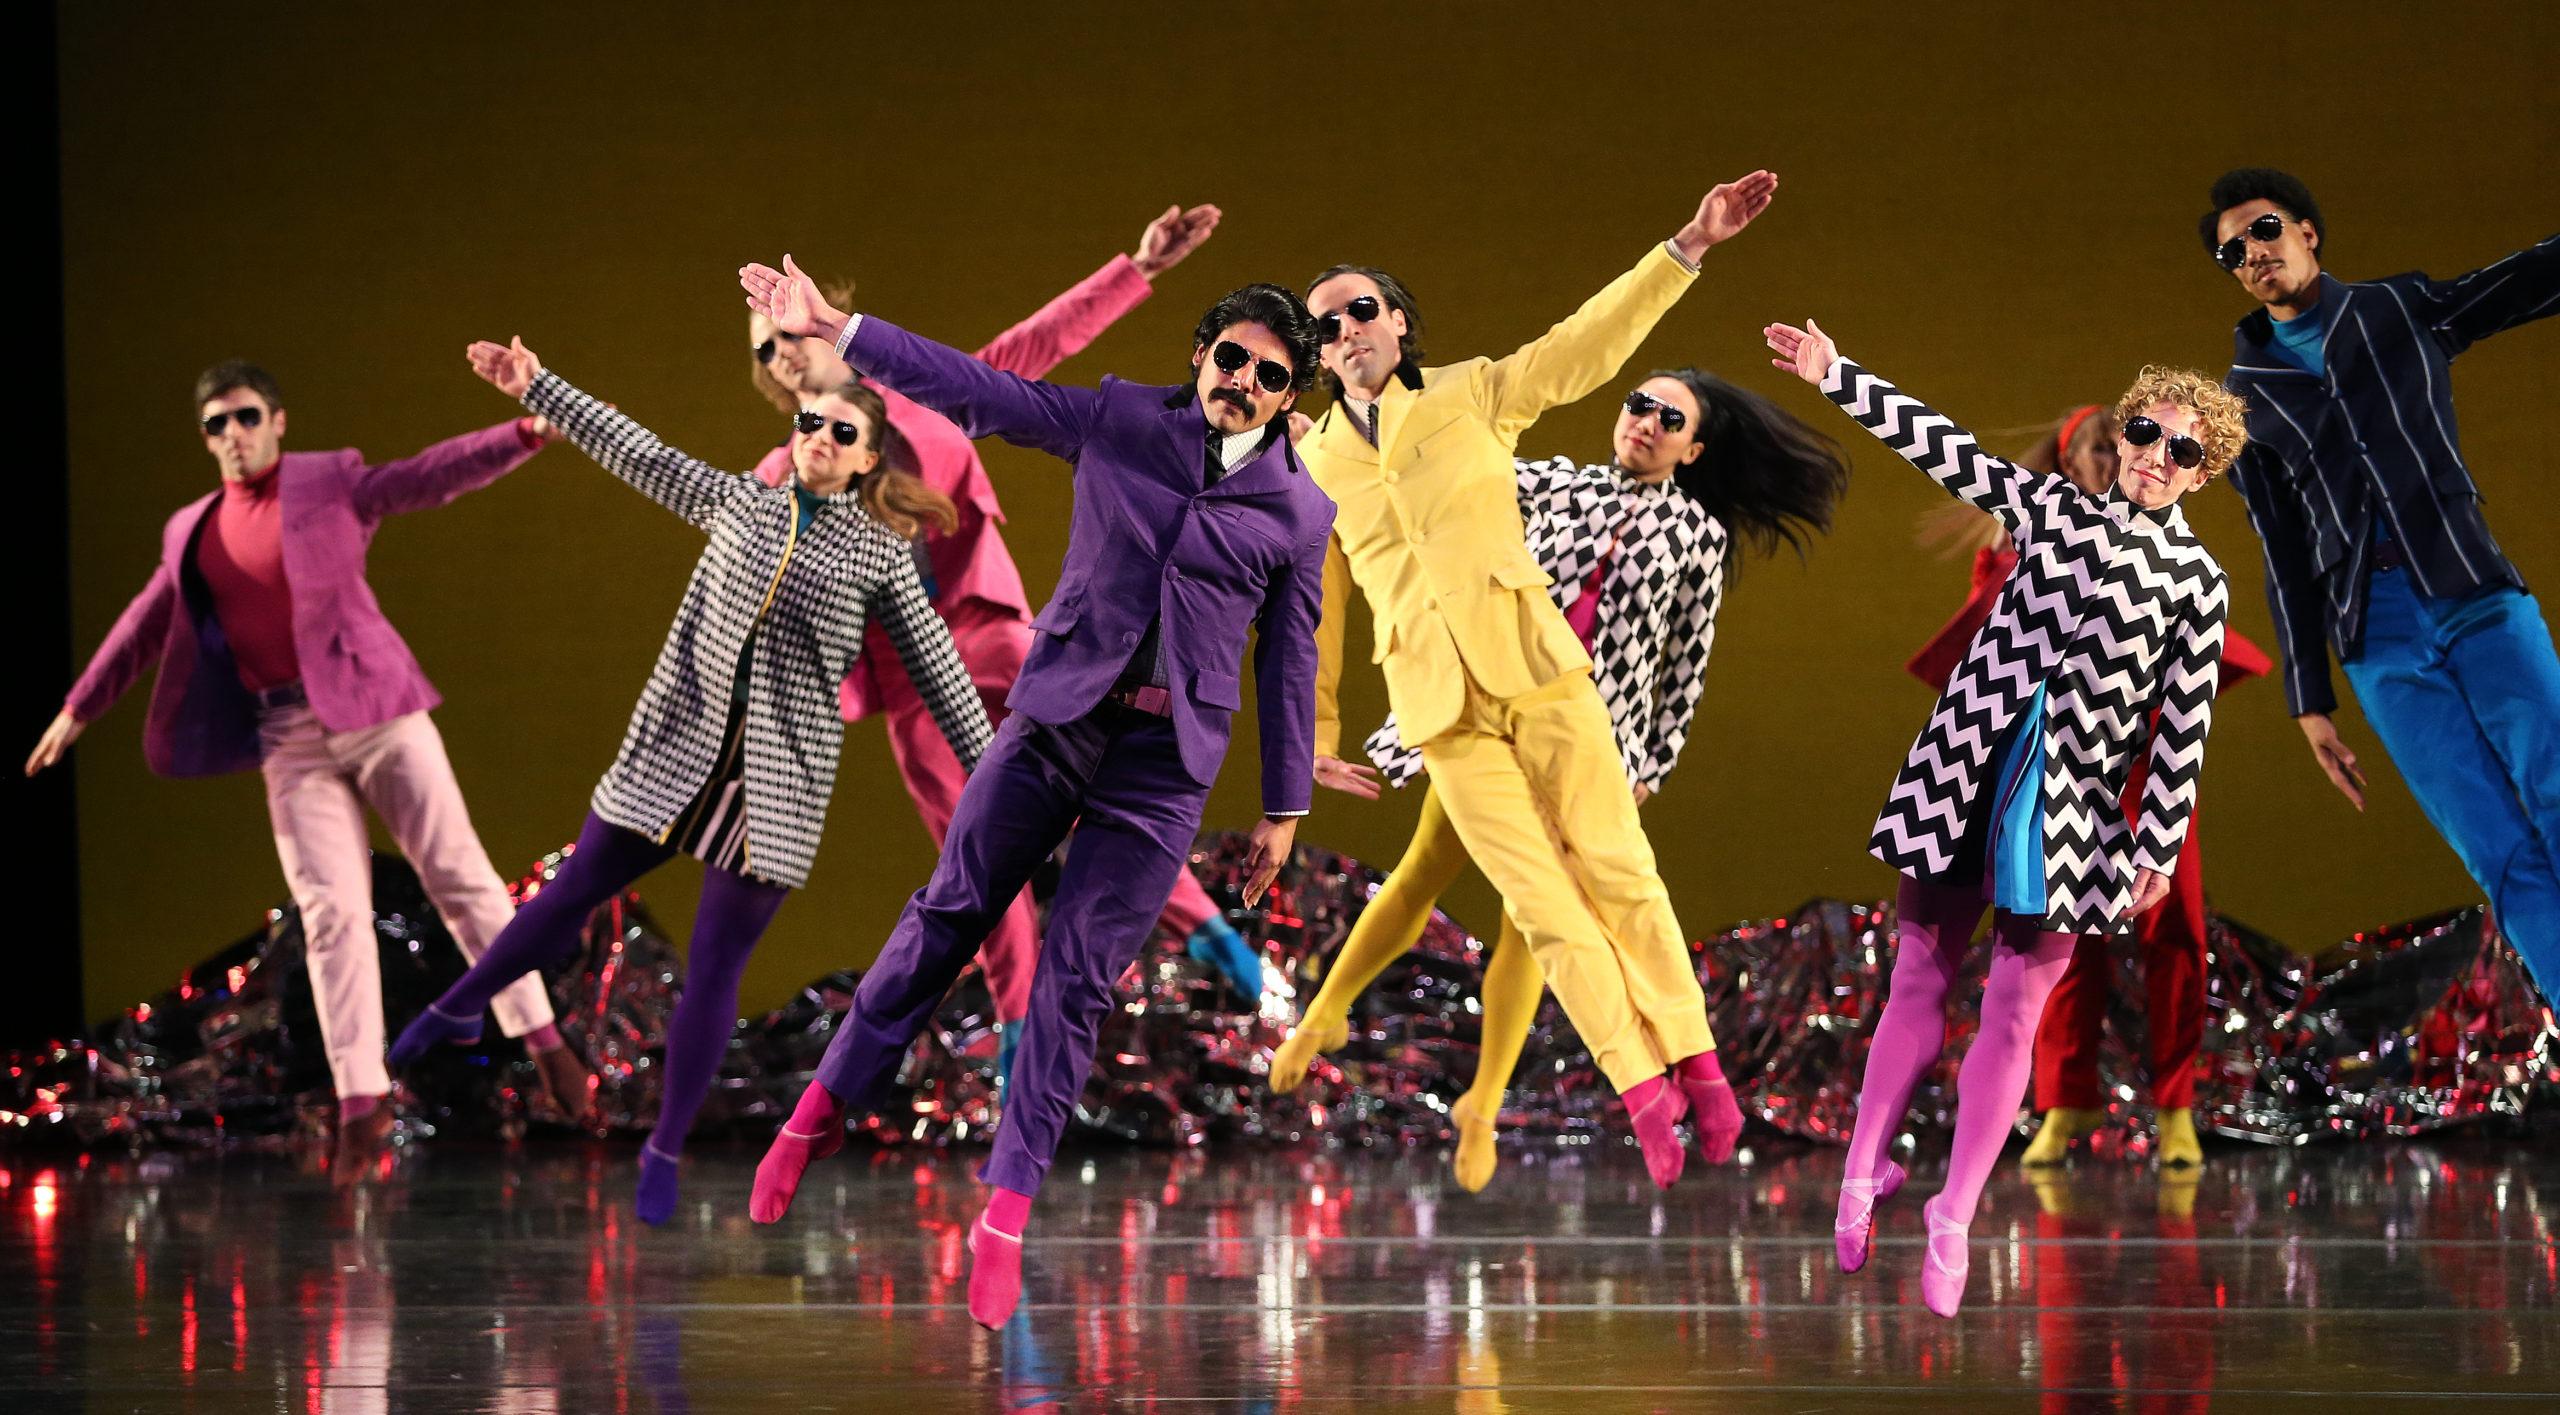 A Transcendent Re-Invasion: Mark Morris Dance Group Presents its Kaleidoscopic Interpretation of the Beatles in Pepperland